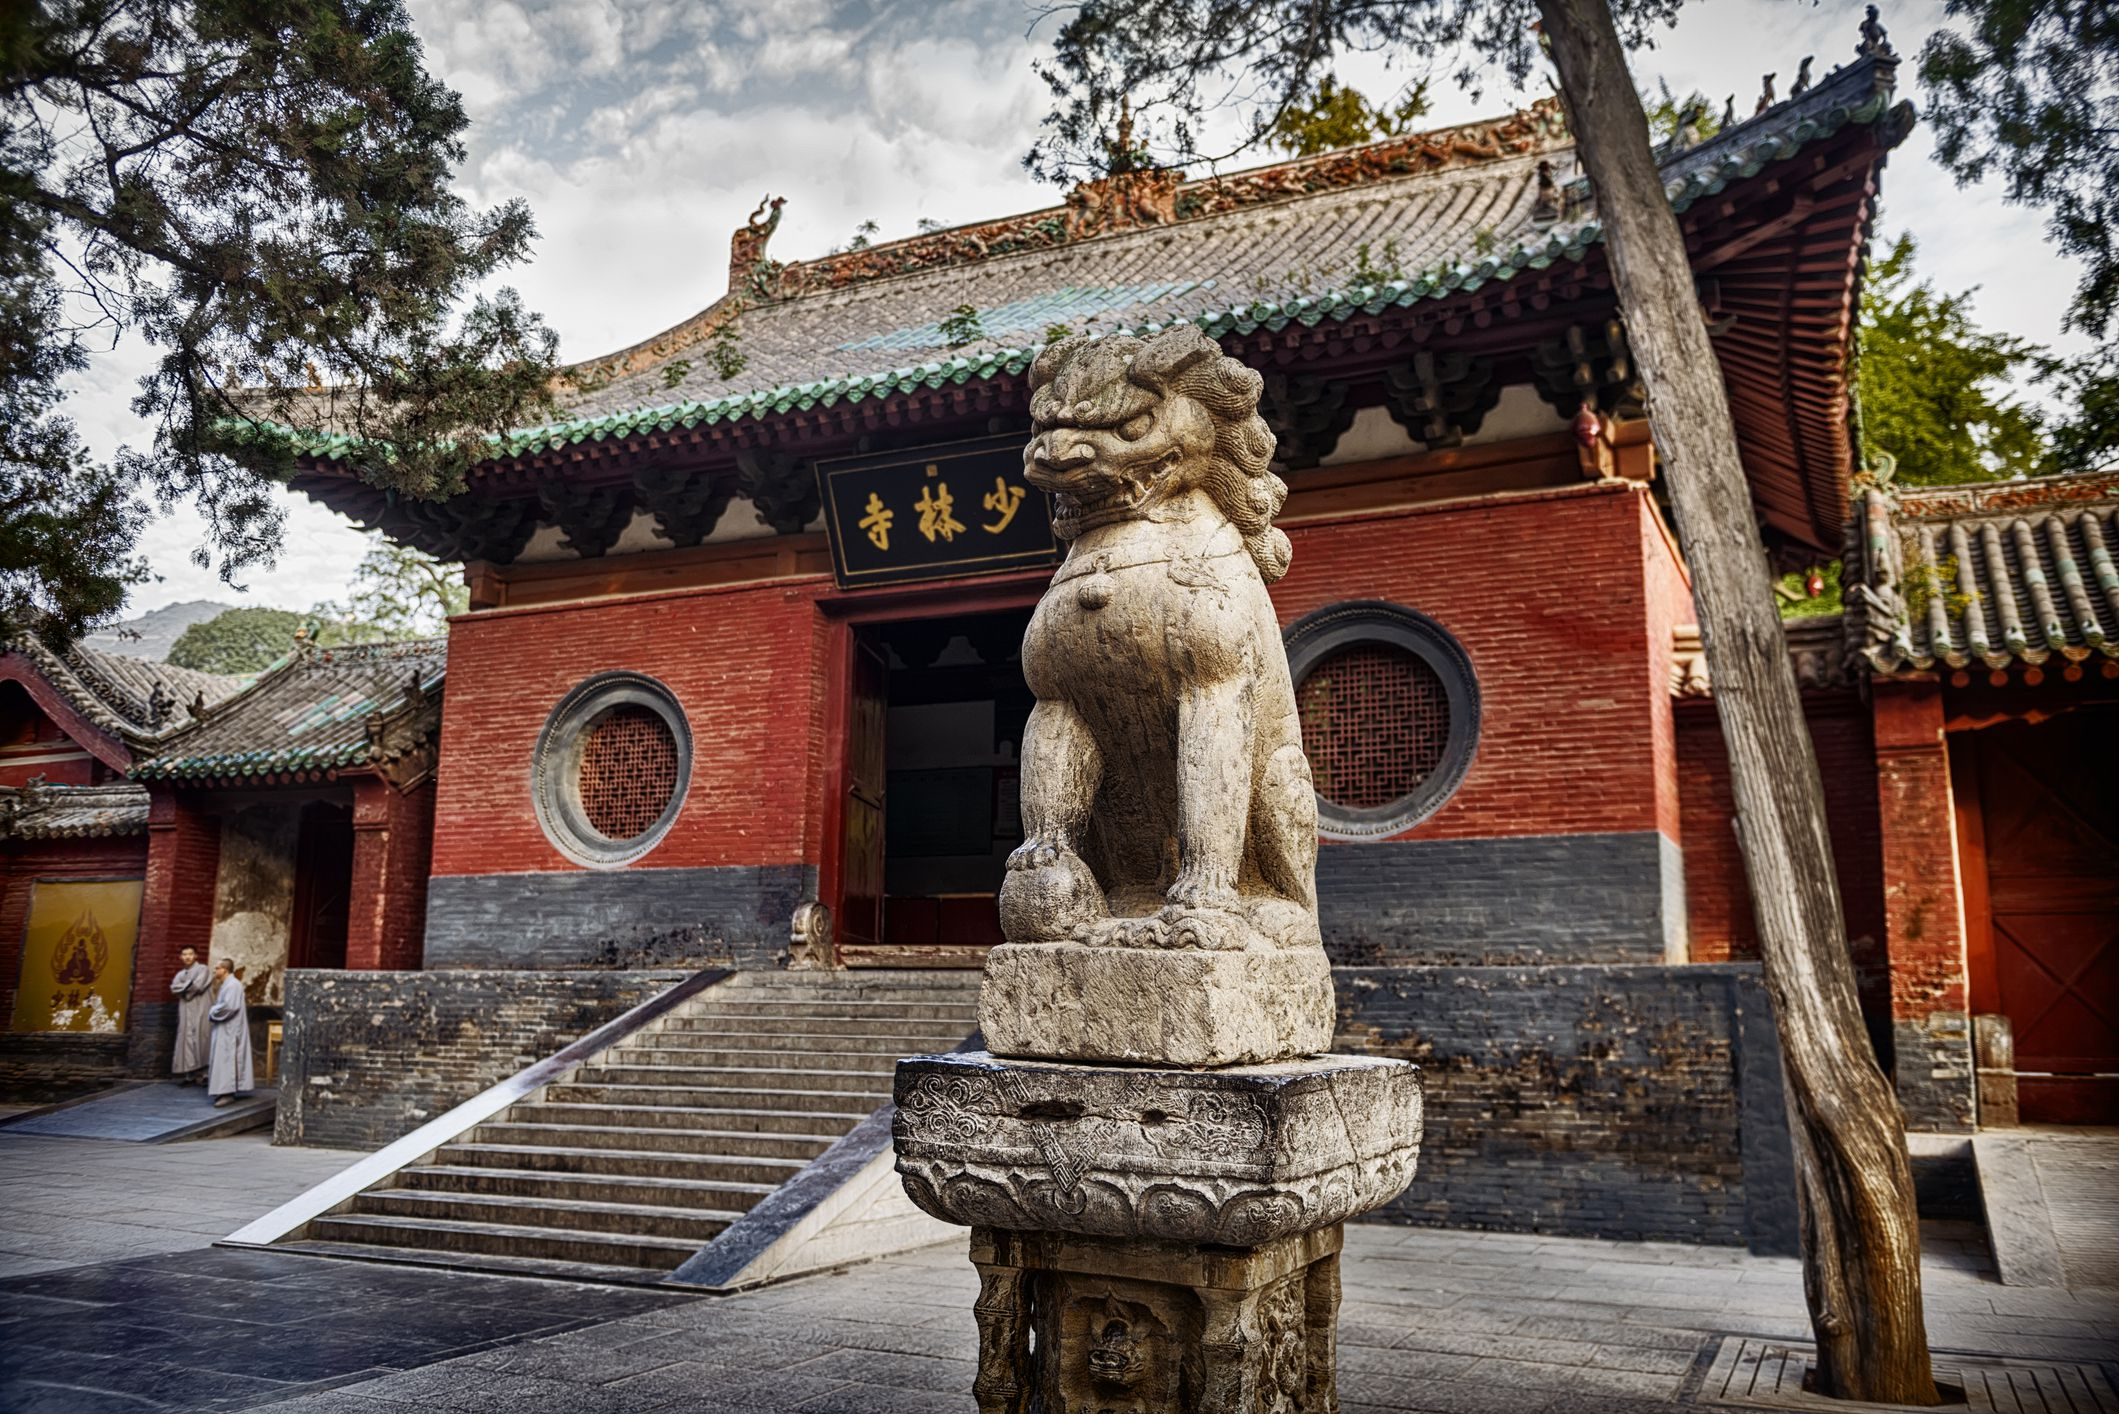 Dragon sculpture in front of the Shaolin Temple in DengFeng, Zhengzhou, Henan Province, China